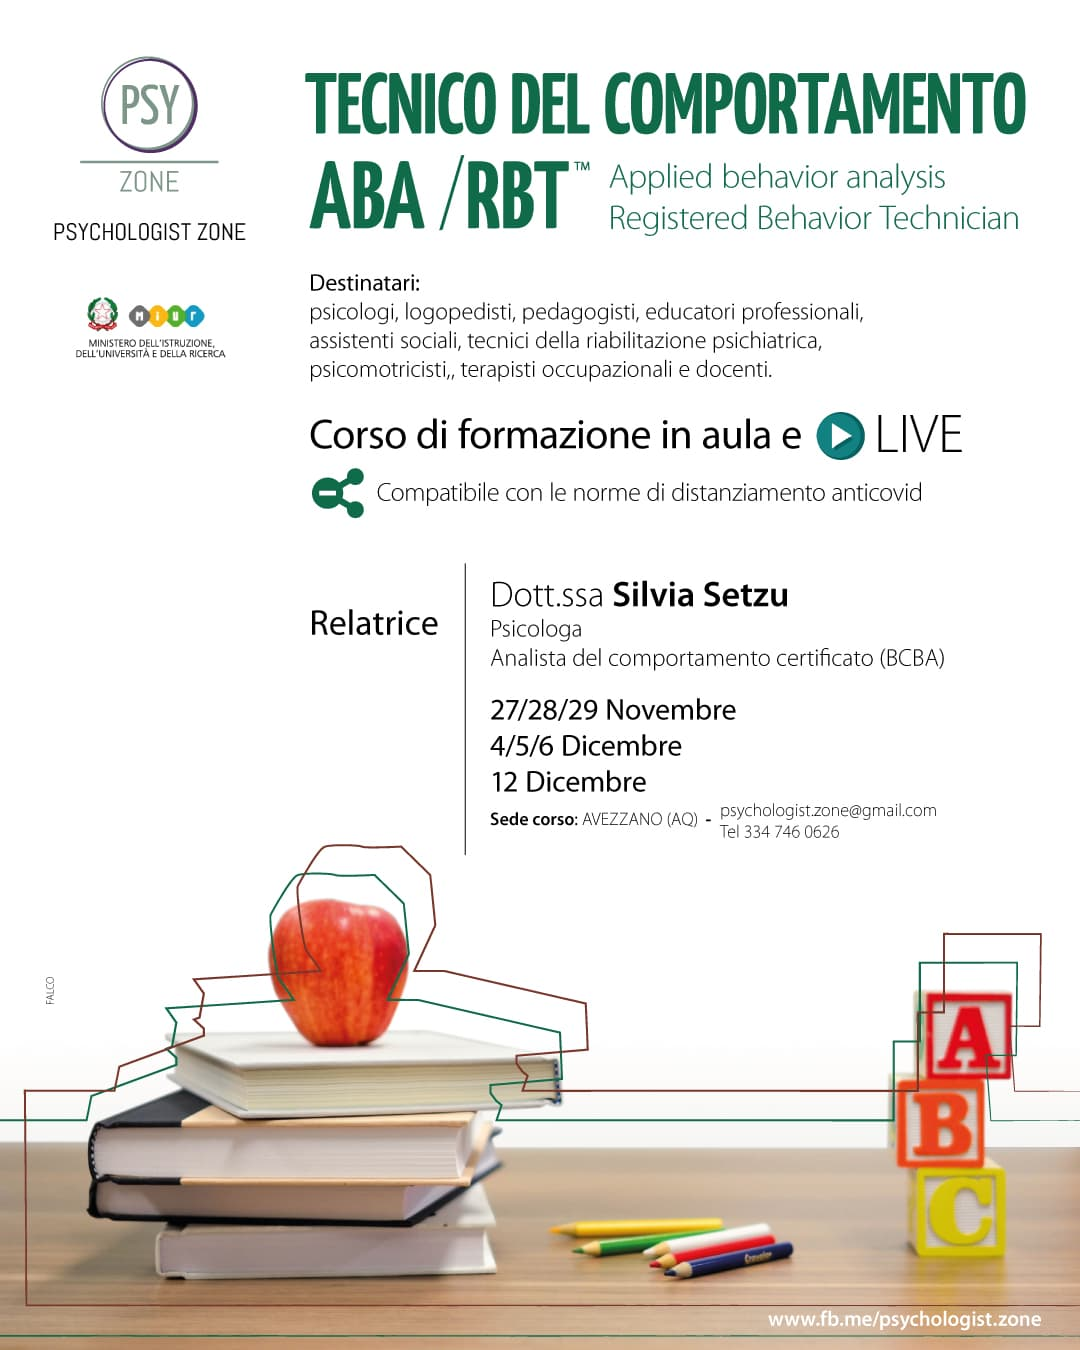 Corso Tecnico del comportamento RBT™ (Registered Behavior Technician™)